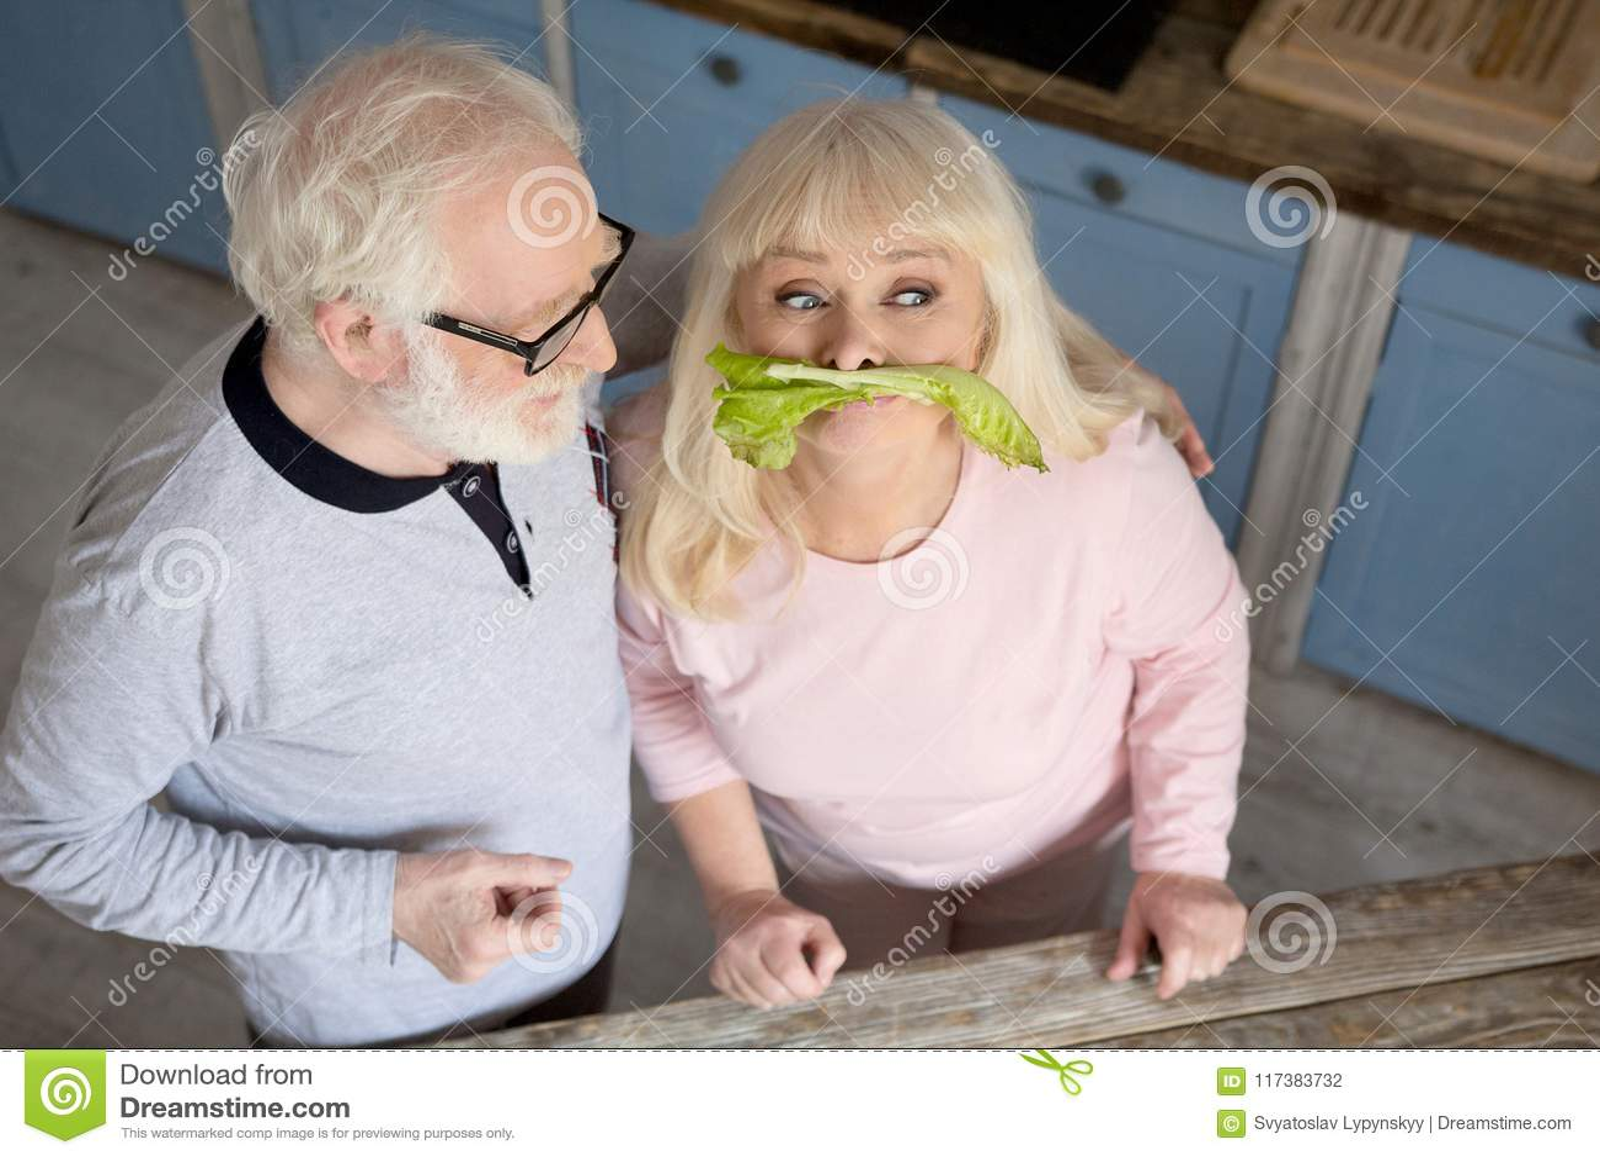 Elderly Couple Having Fun In Kitchen Stock Photo Image Of